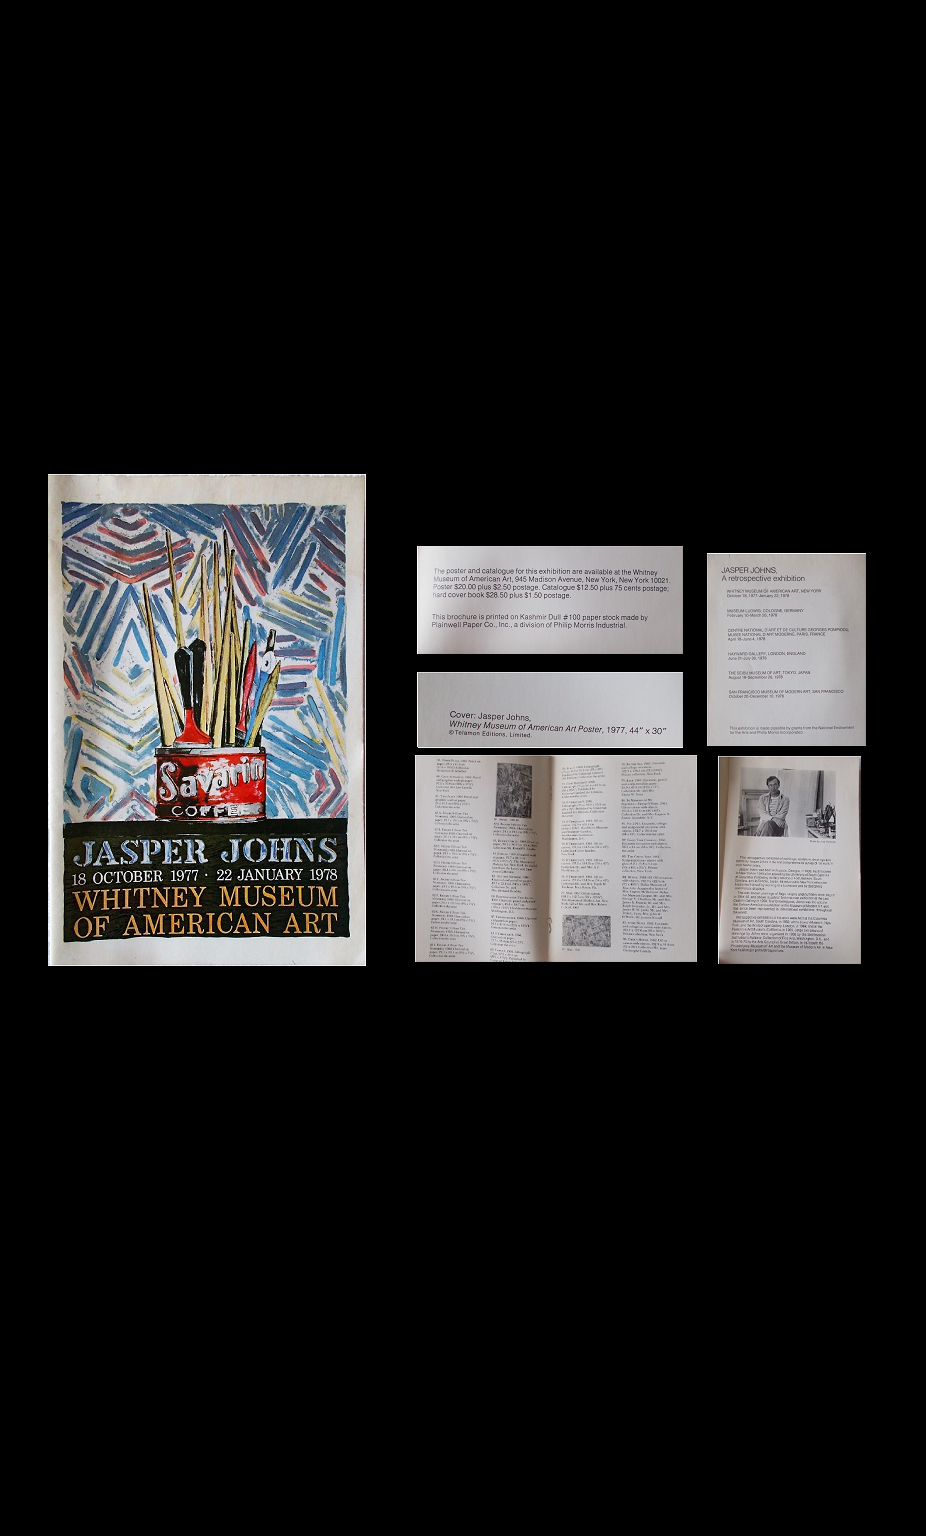 """JASPER JOHNS, Whitney Museum of American Art"" , 1977, Exhibition Catalogue."